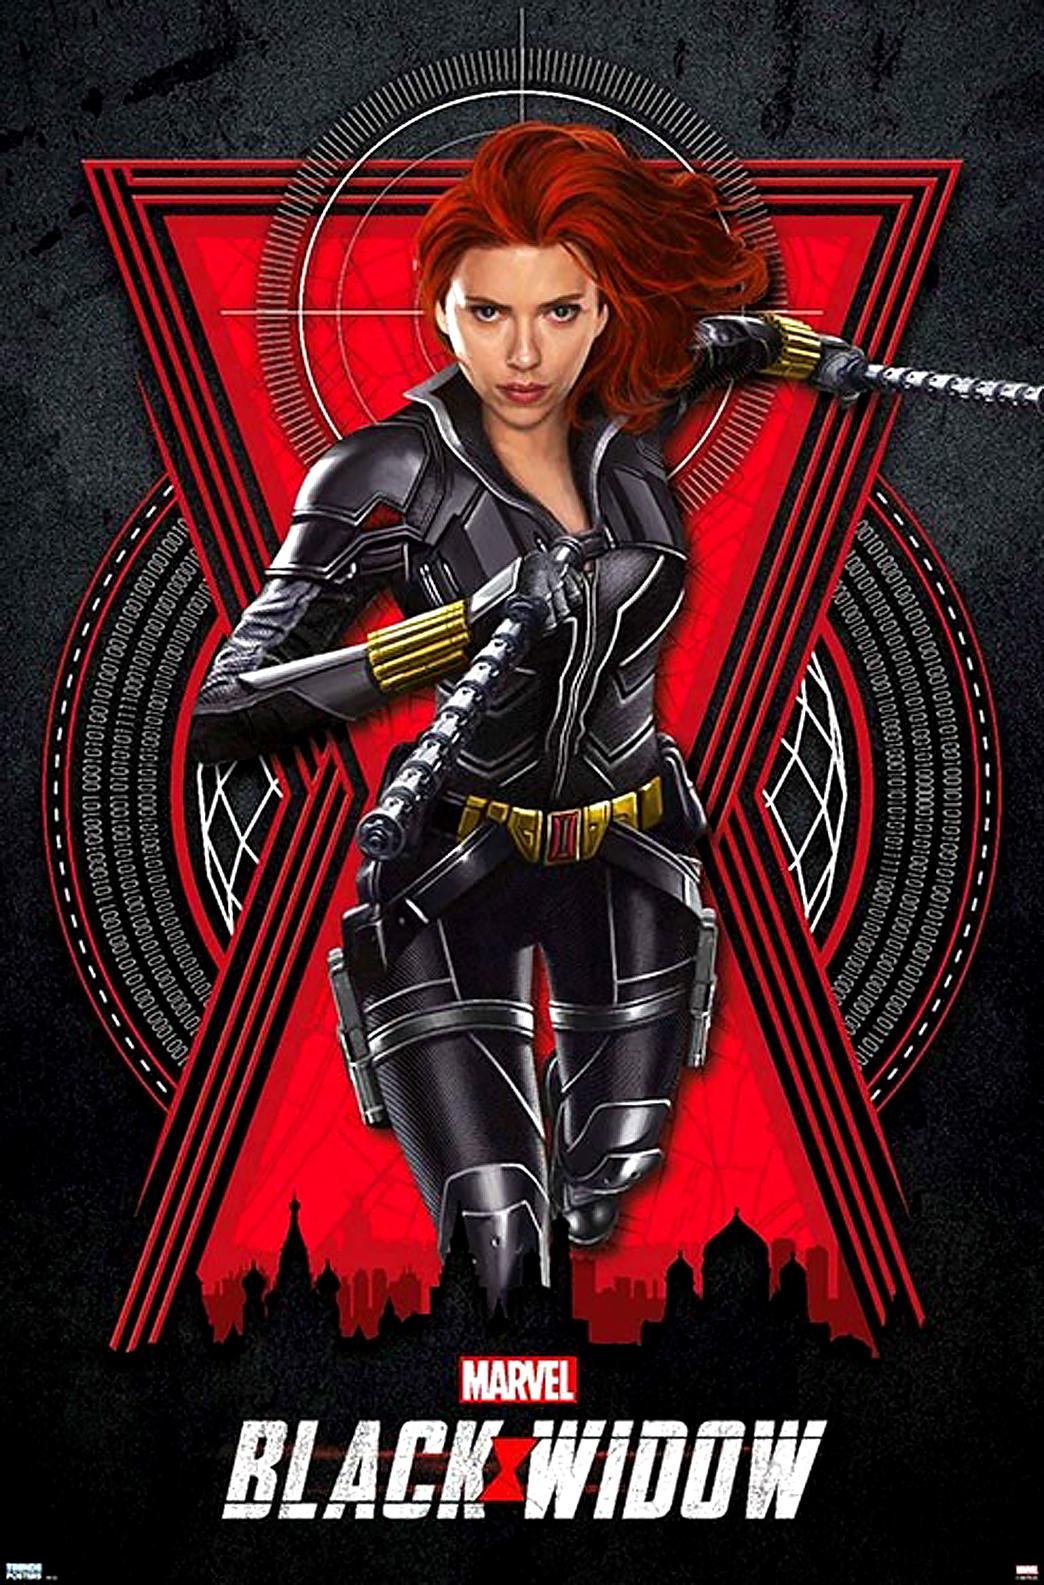 Black Widow (film) poster 009.jpg